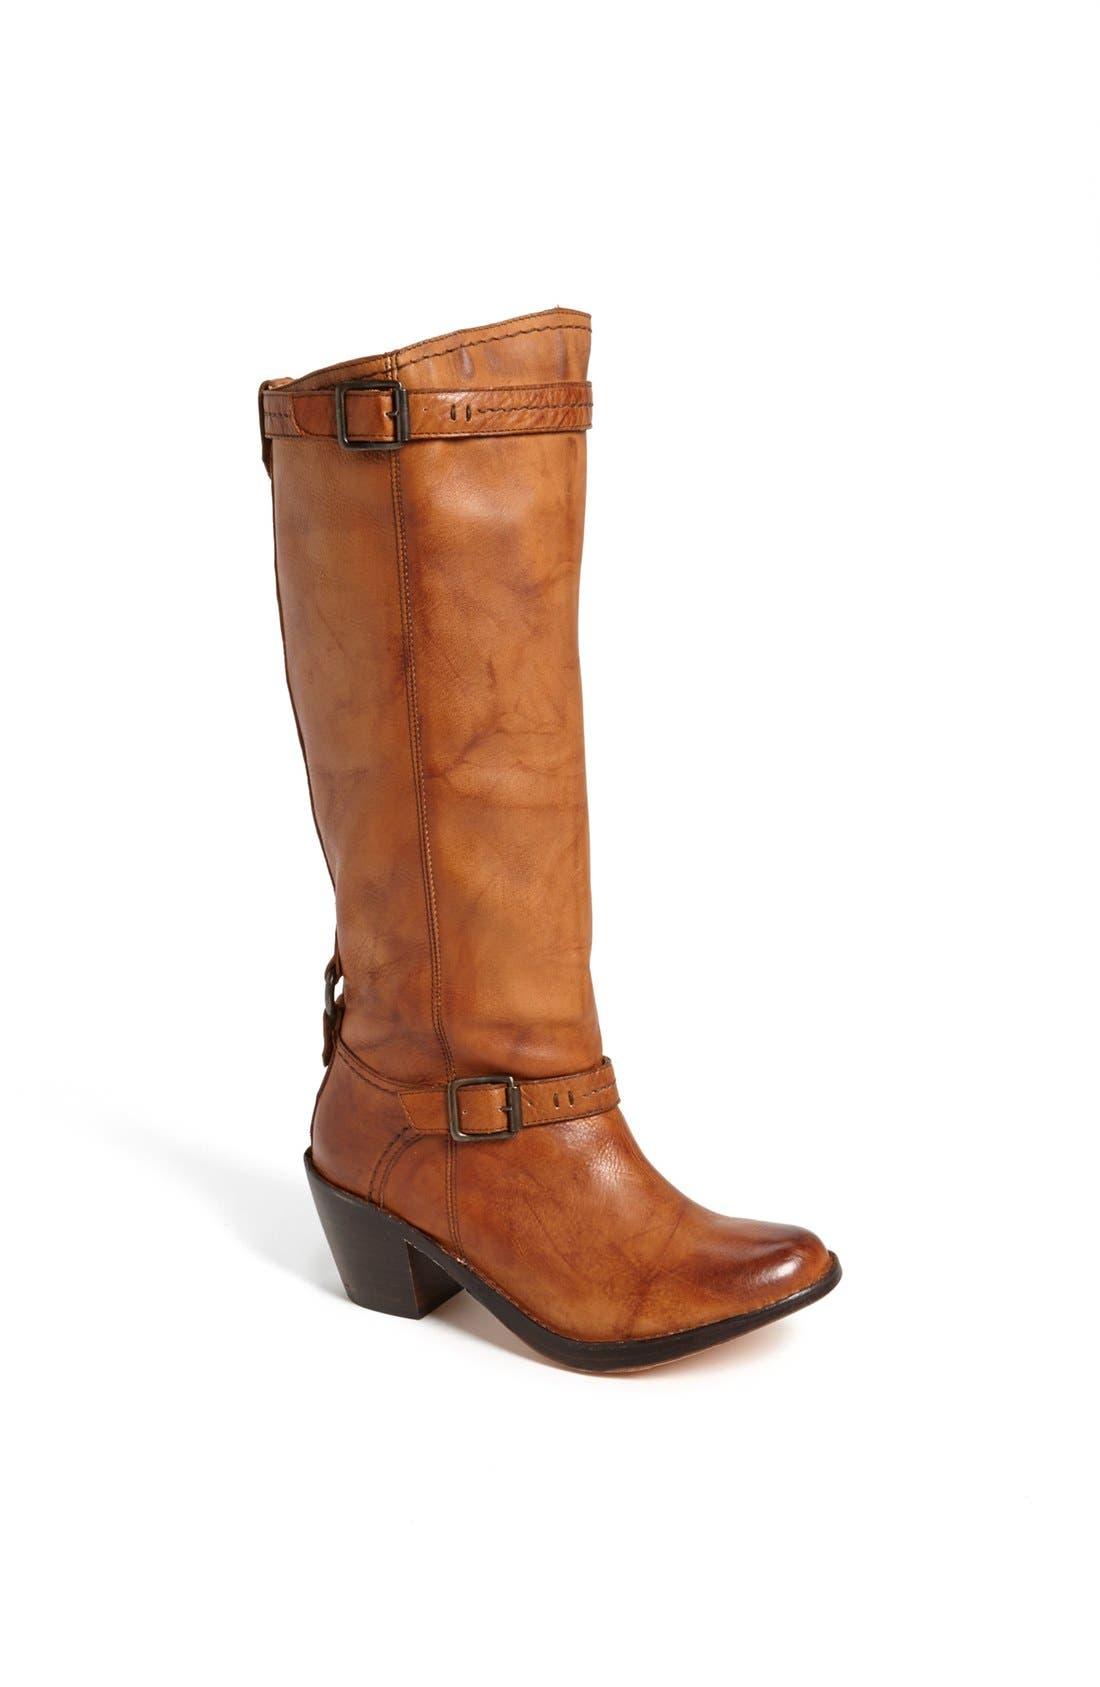 Alternate Image 1 Selected - Frye 'Carmen' Boot